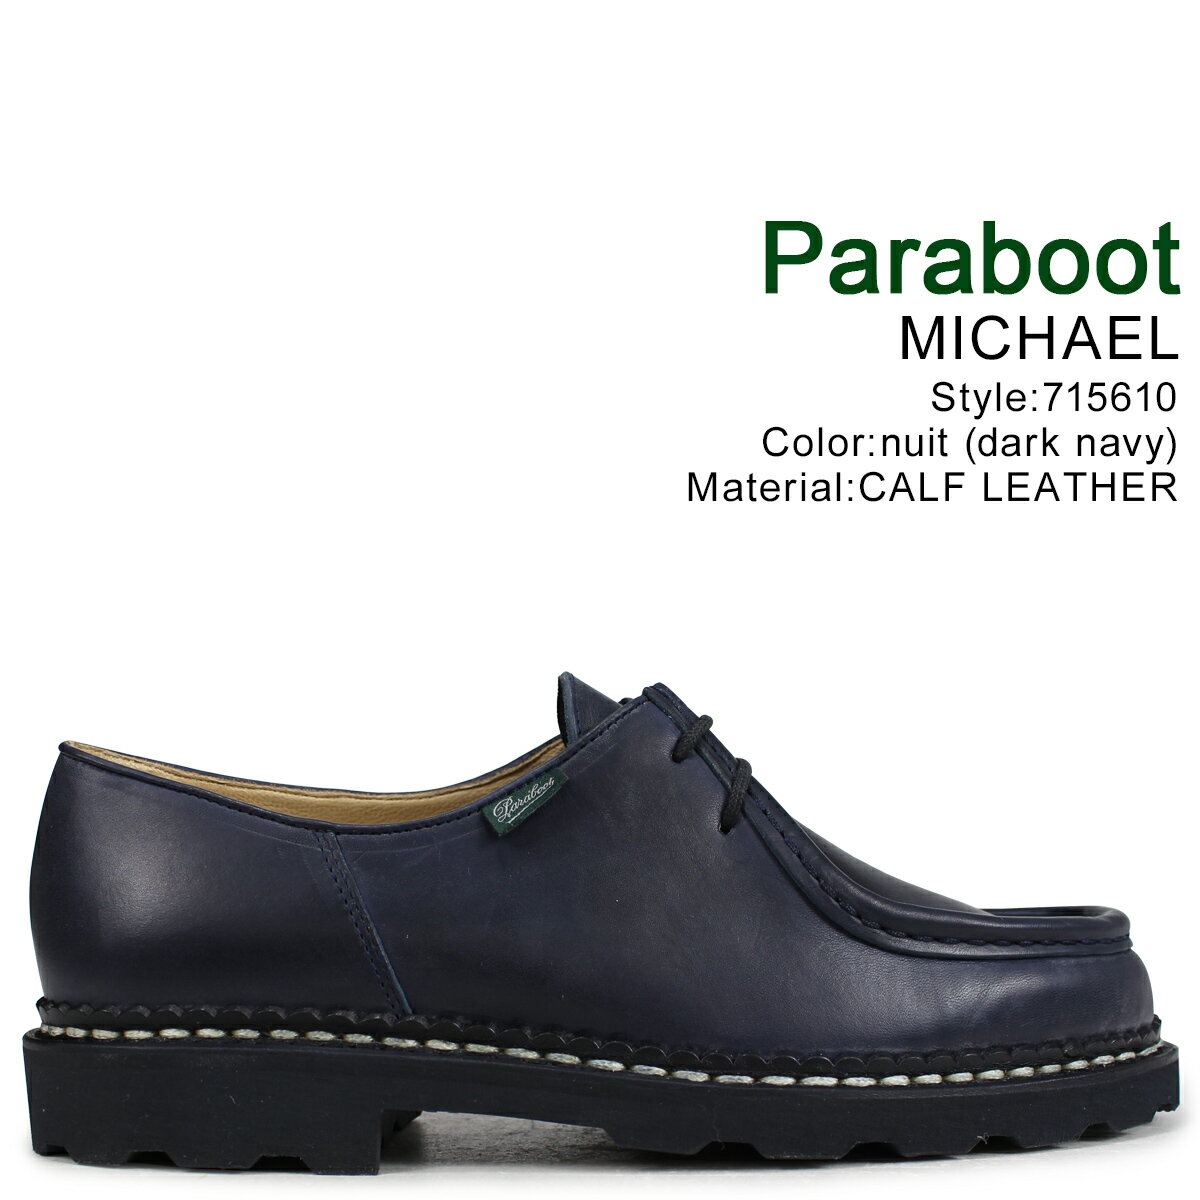 PARABOOT ミカエル パラブーツ MICHAEL シューズ チロリアンシューズ 715610 メンズ 靴 ネイビー